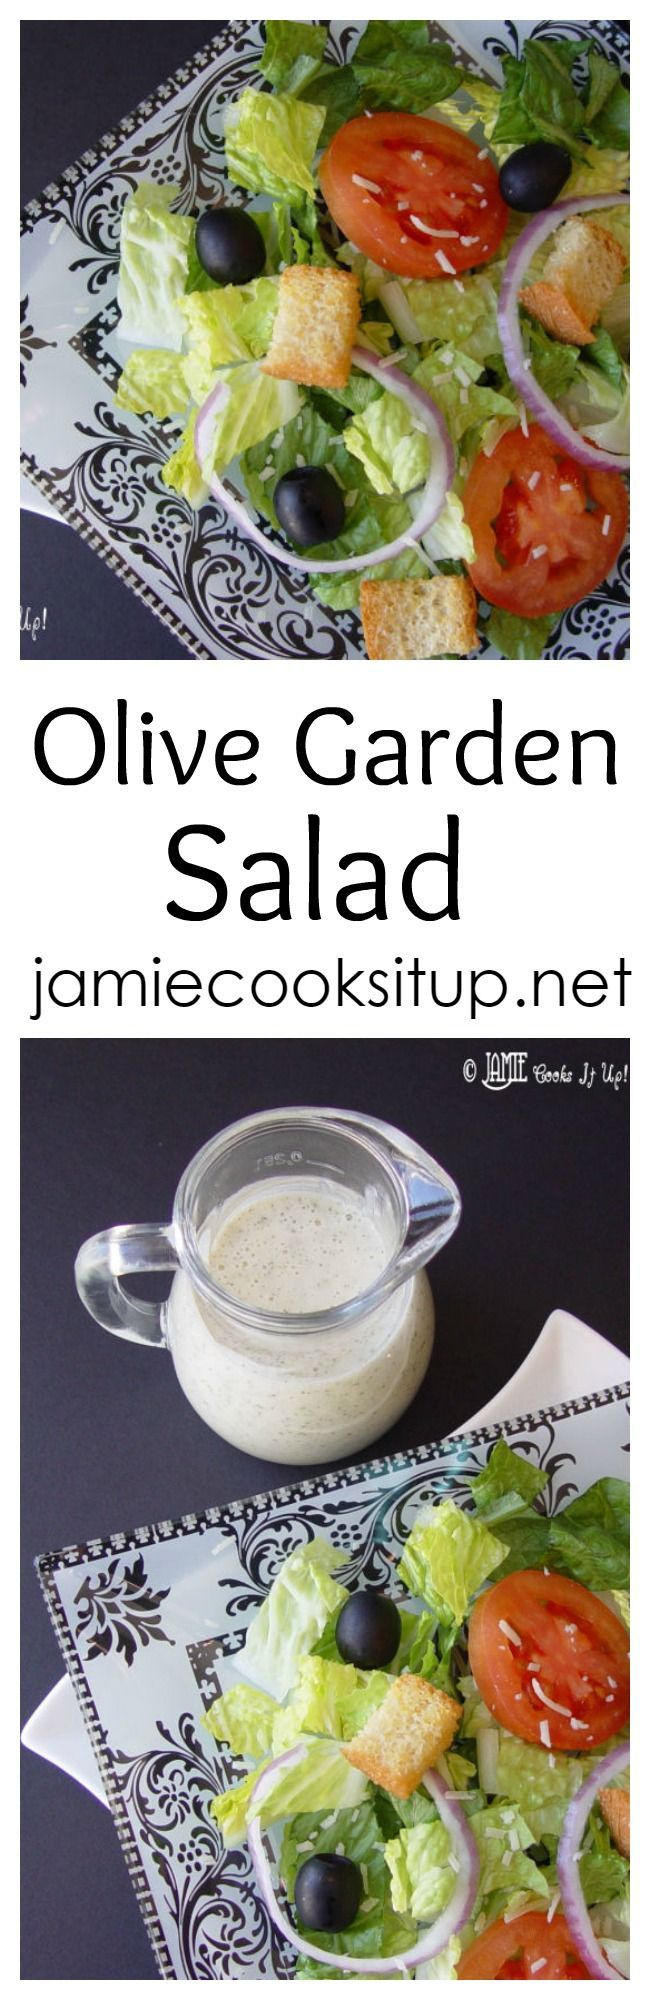 Best 25 Olive Garden Salad Ideas On Pinterest Olive